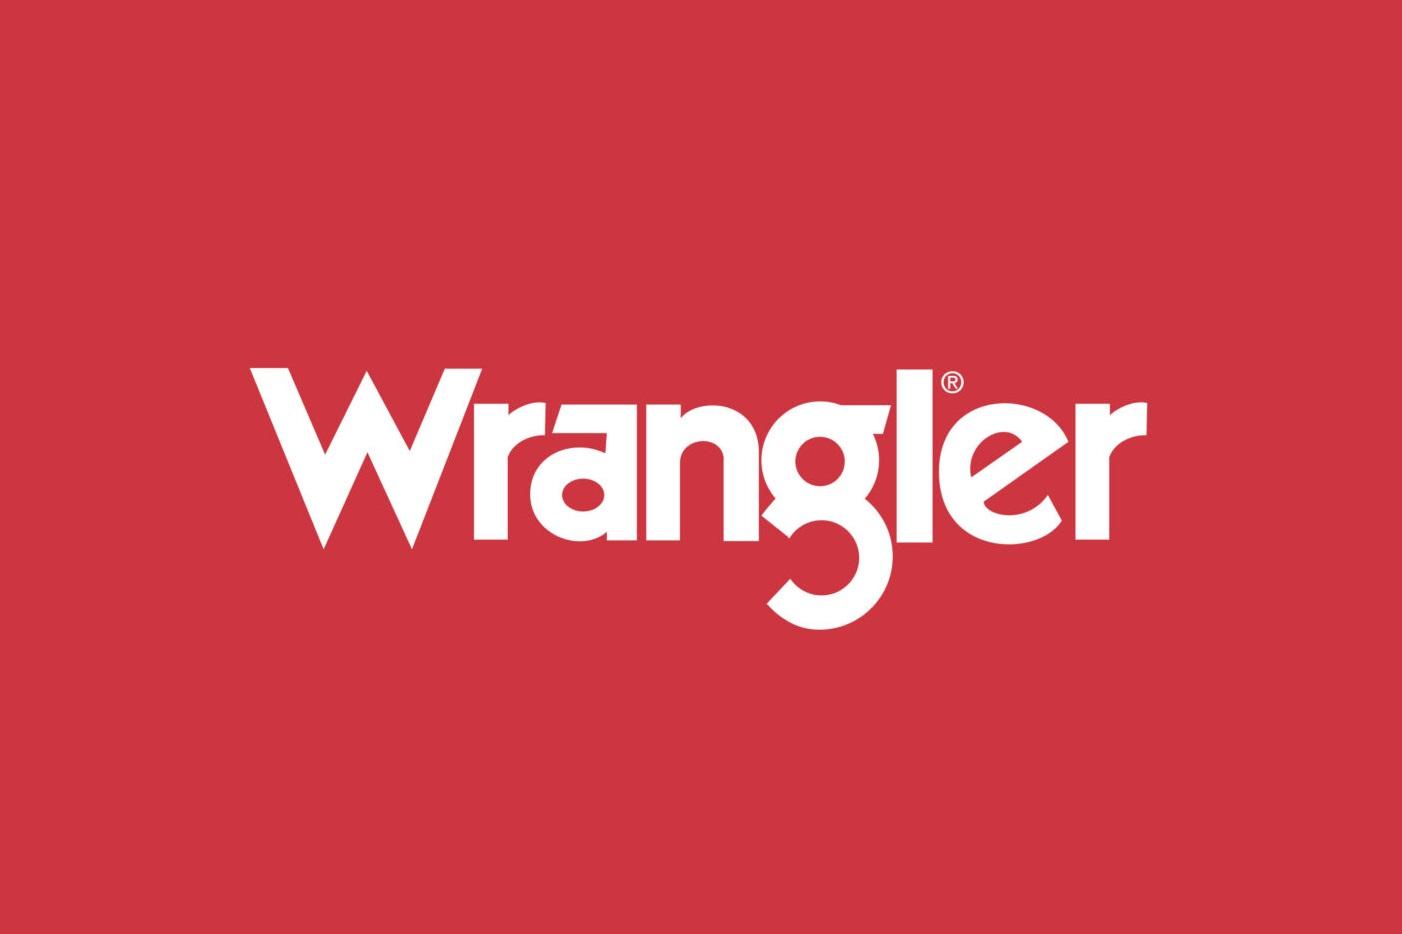 wrangler_white_red_box1293734-1024x412